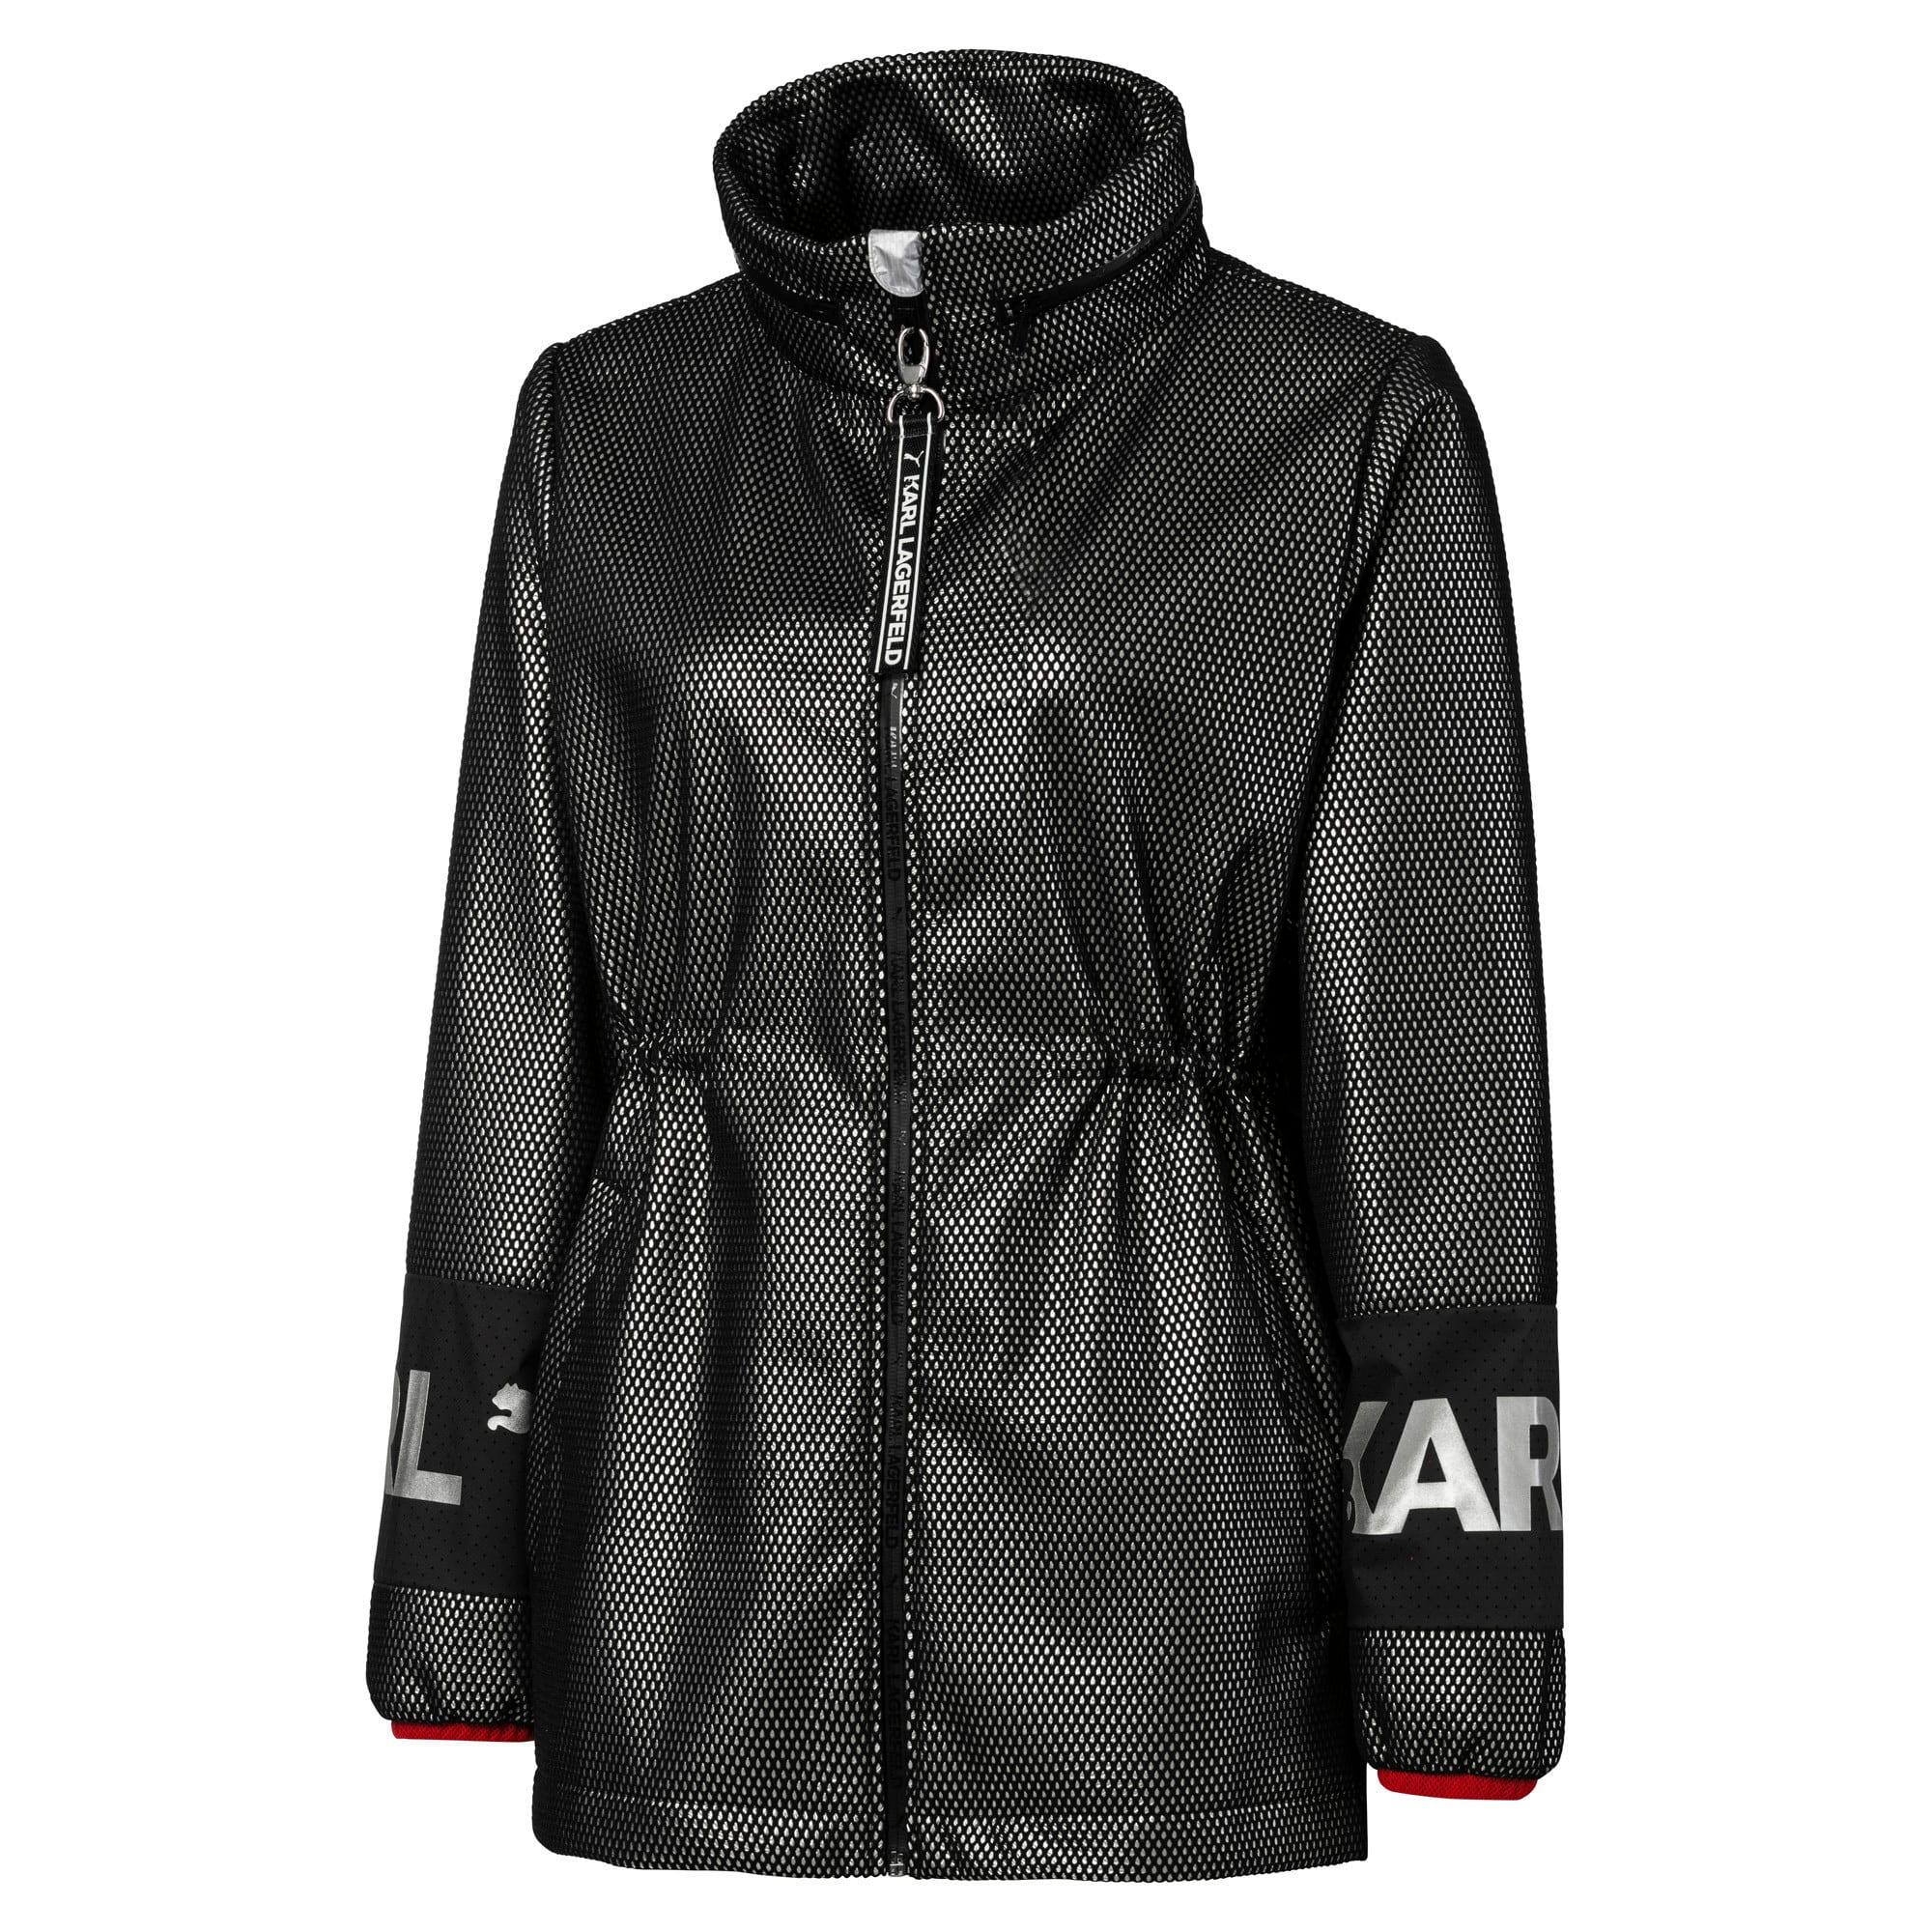 Thumbnail 8 of PUMA x KARL LAGERFELD Women's Outerwear Jacket, Puma Black, medium